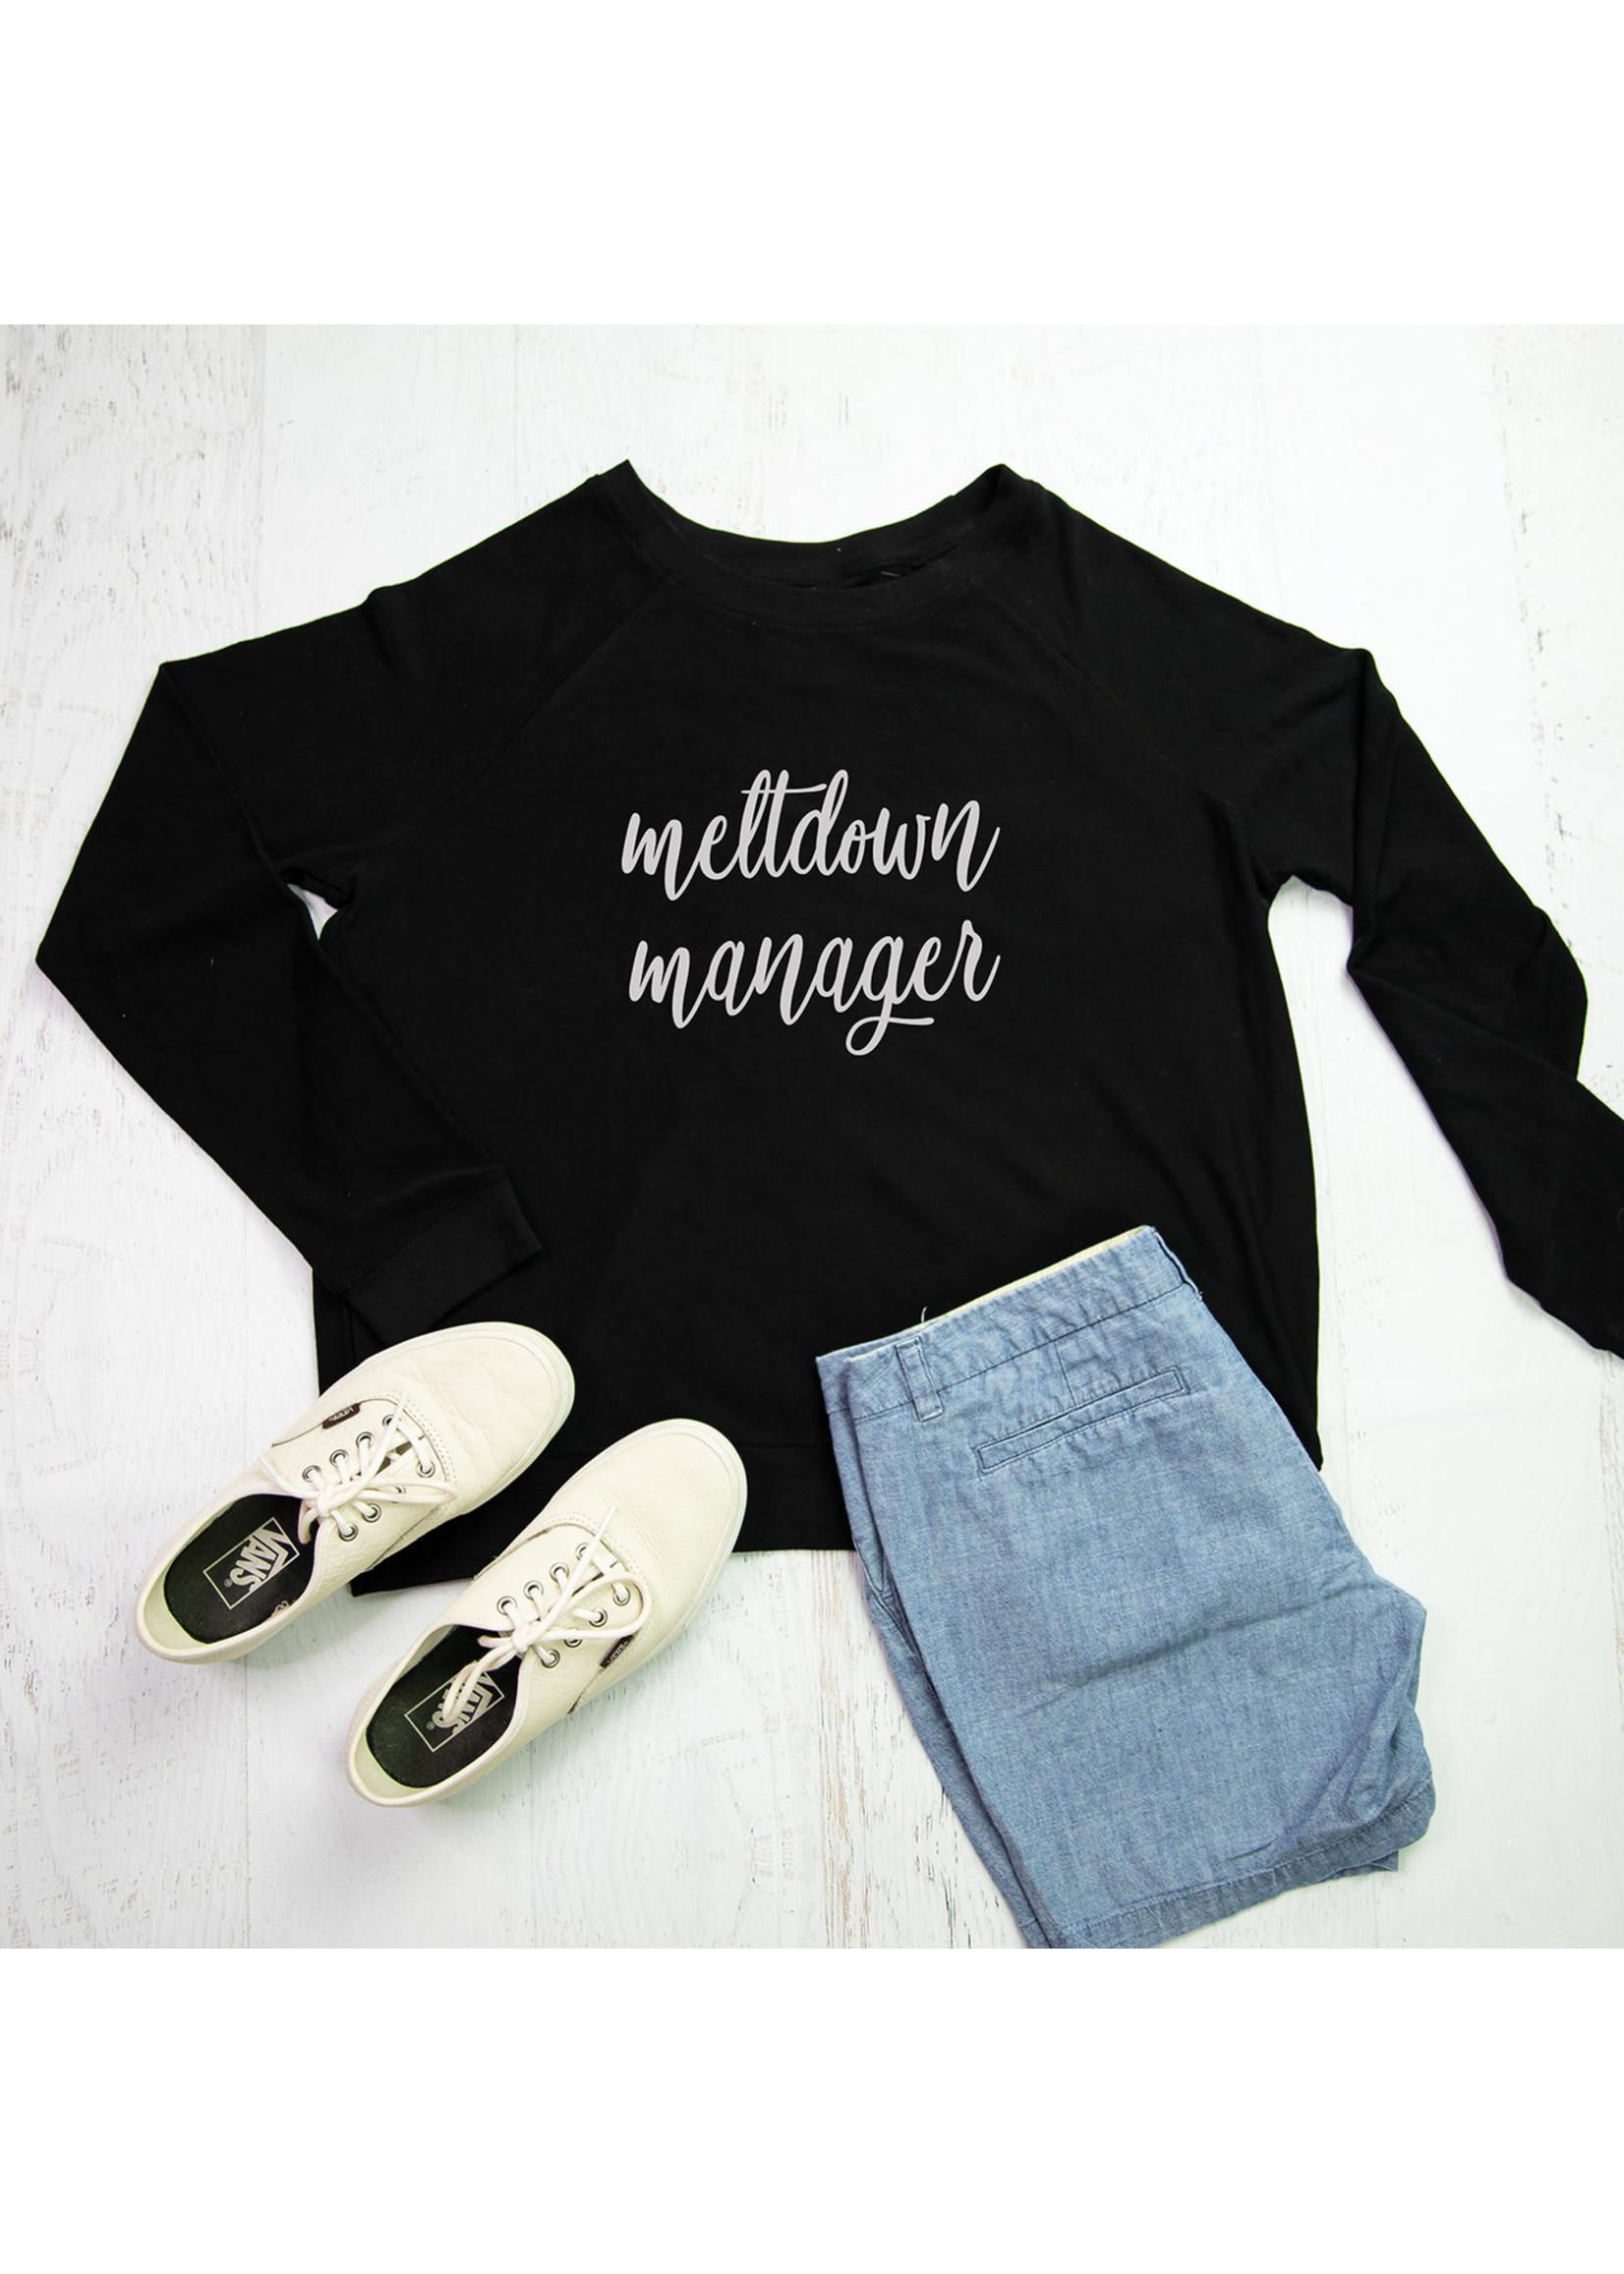 Mary Square Sweatshirt Meltdown Manager